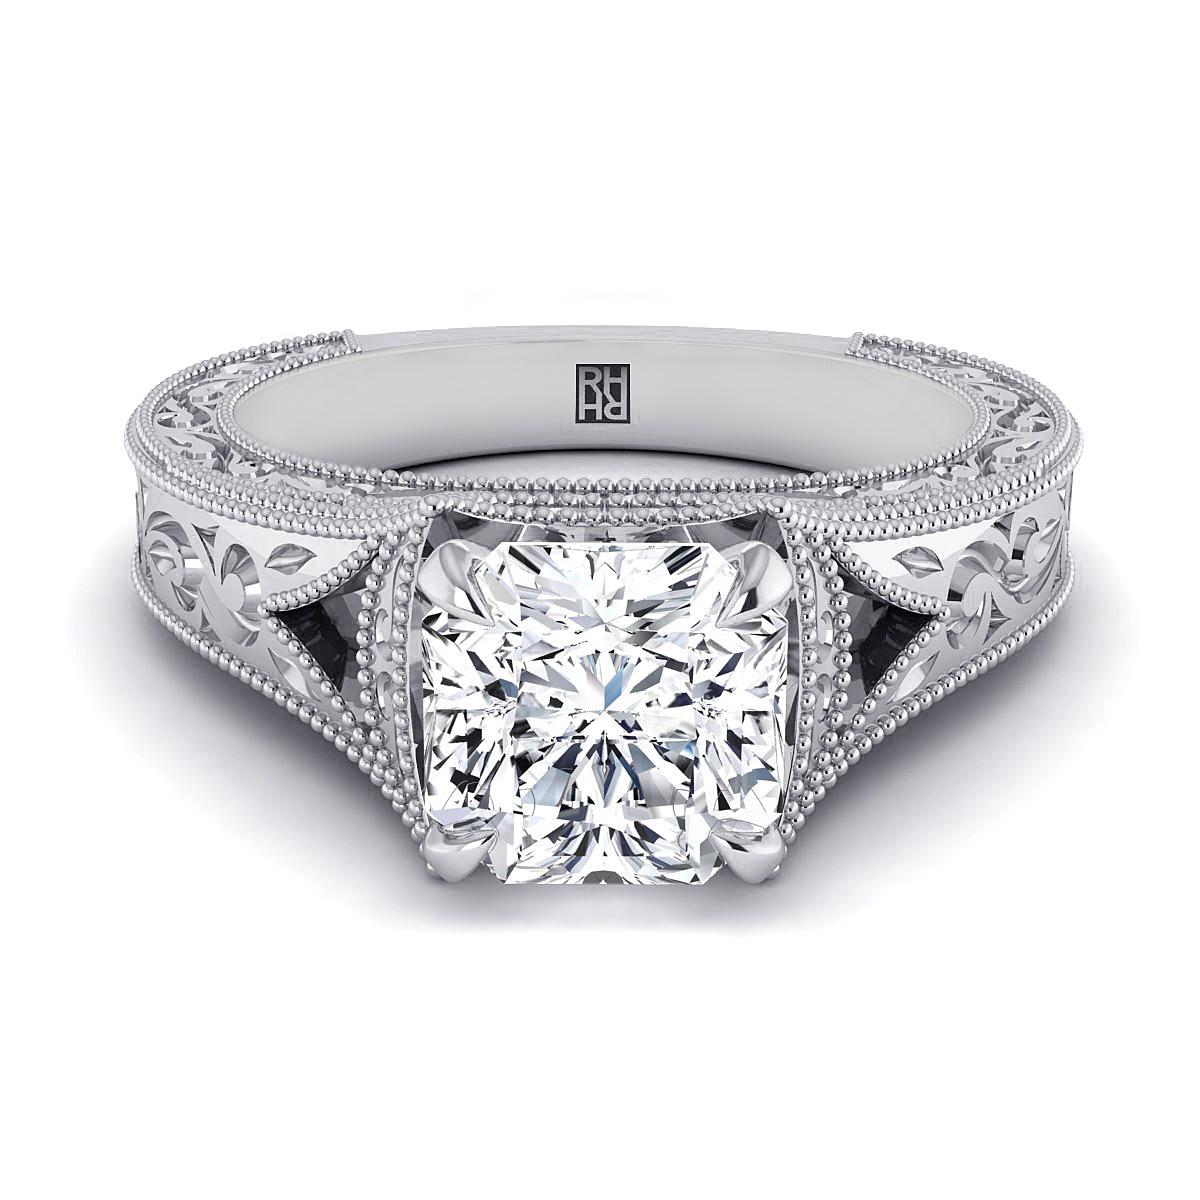 Diamond Engagement Ring History  Few Facts about Diamond Engagement Ring History